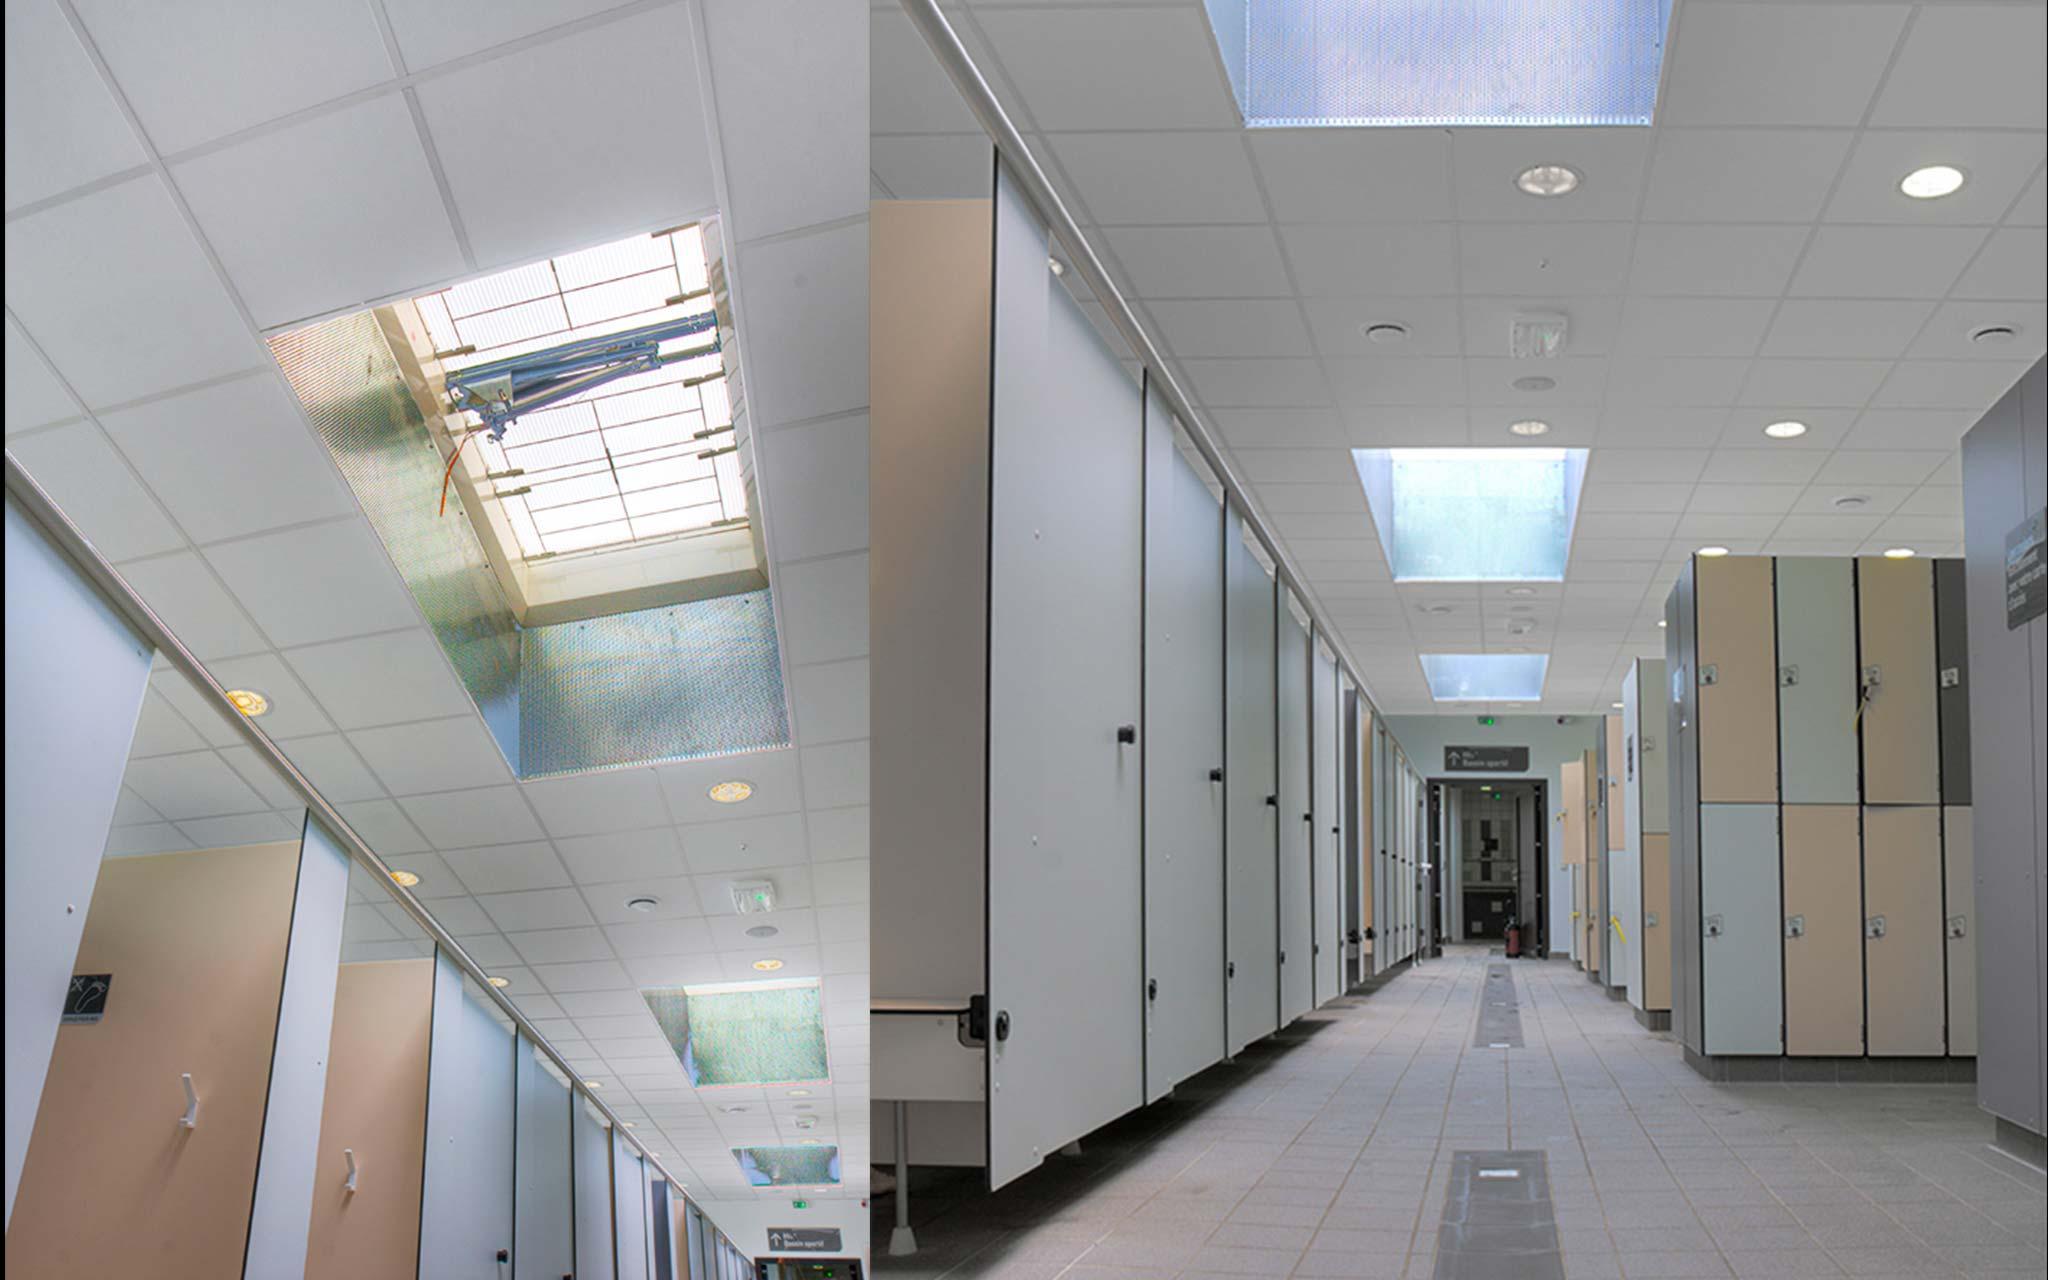 plafond suspendu dans les vestiaires therond plafond. Black Bedroom Furniture Sets. Home Design Ideas